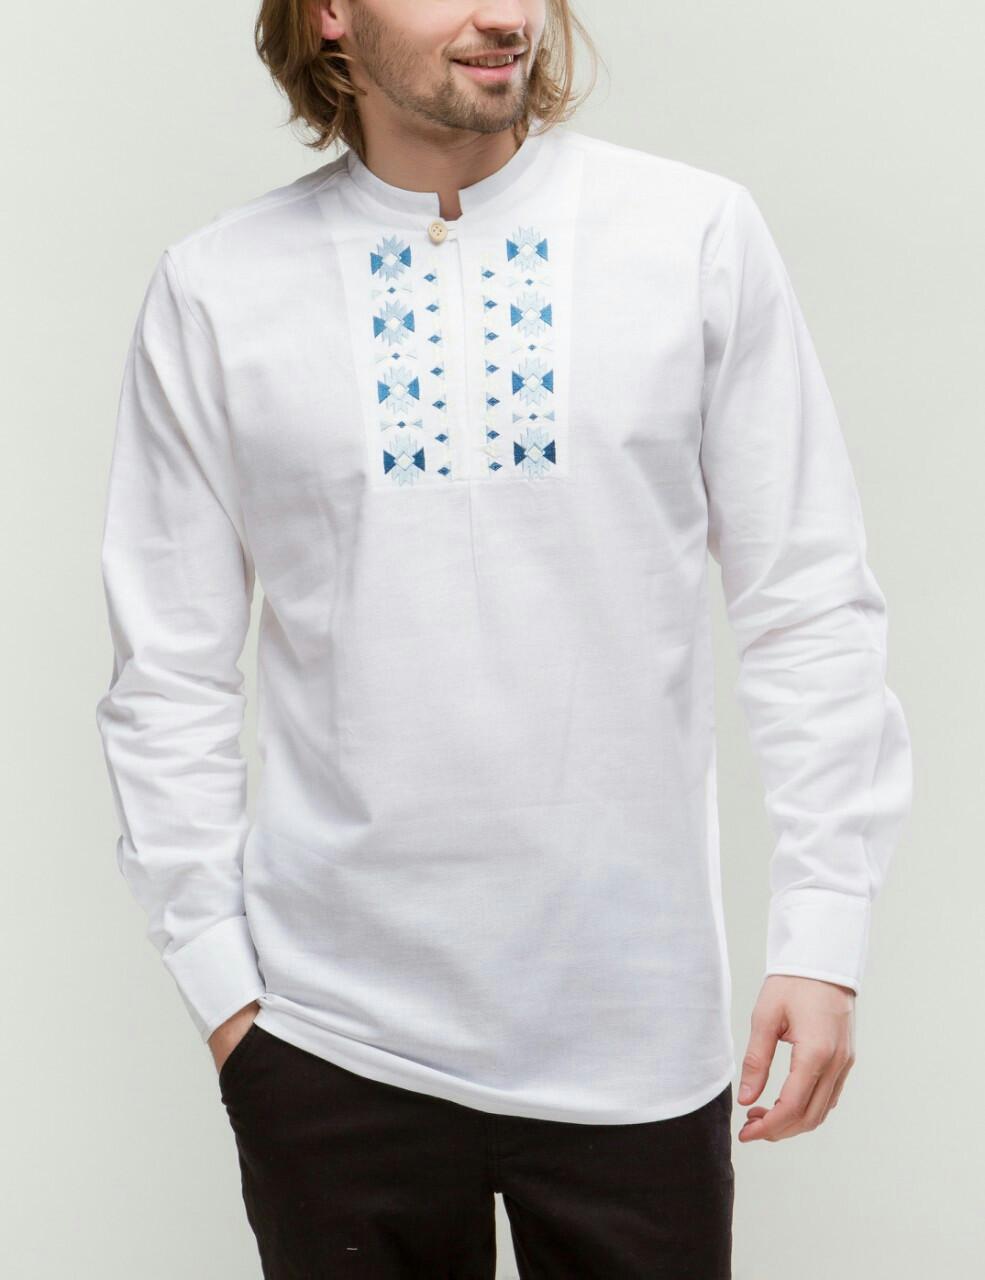 Рубашки мужские - вышивка Радан